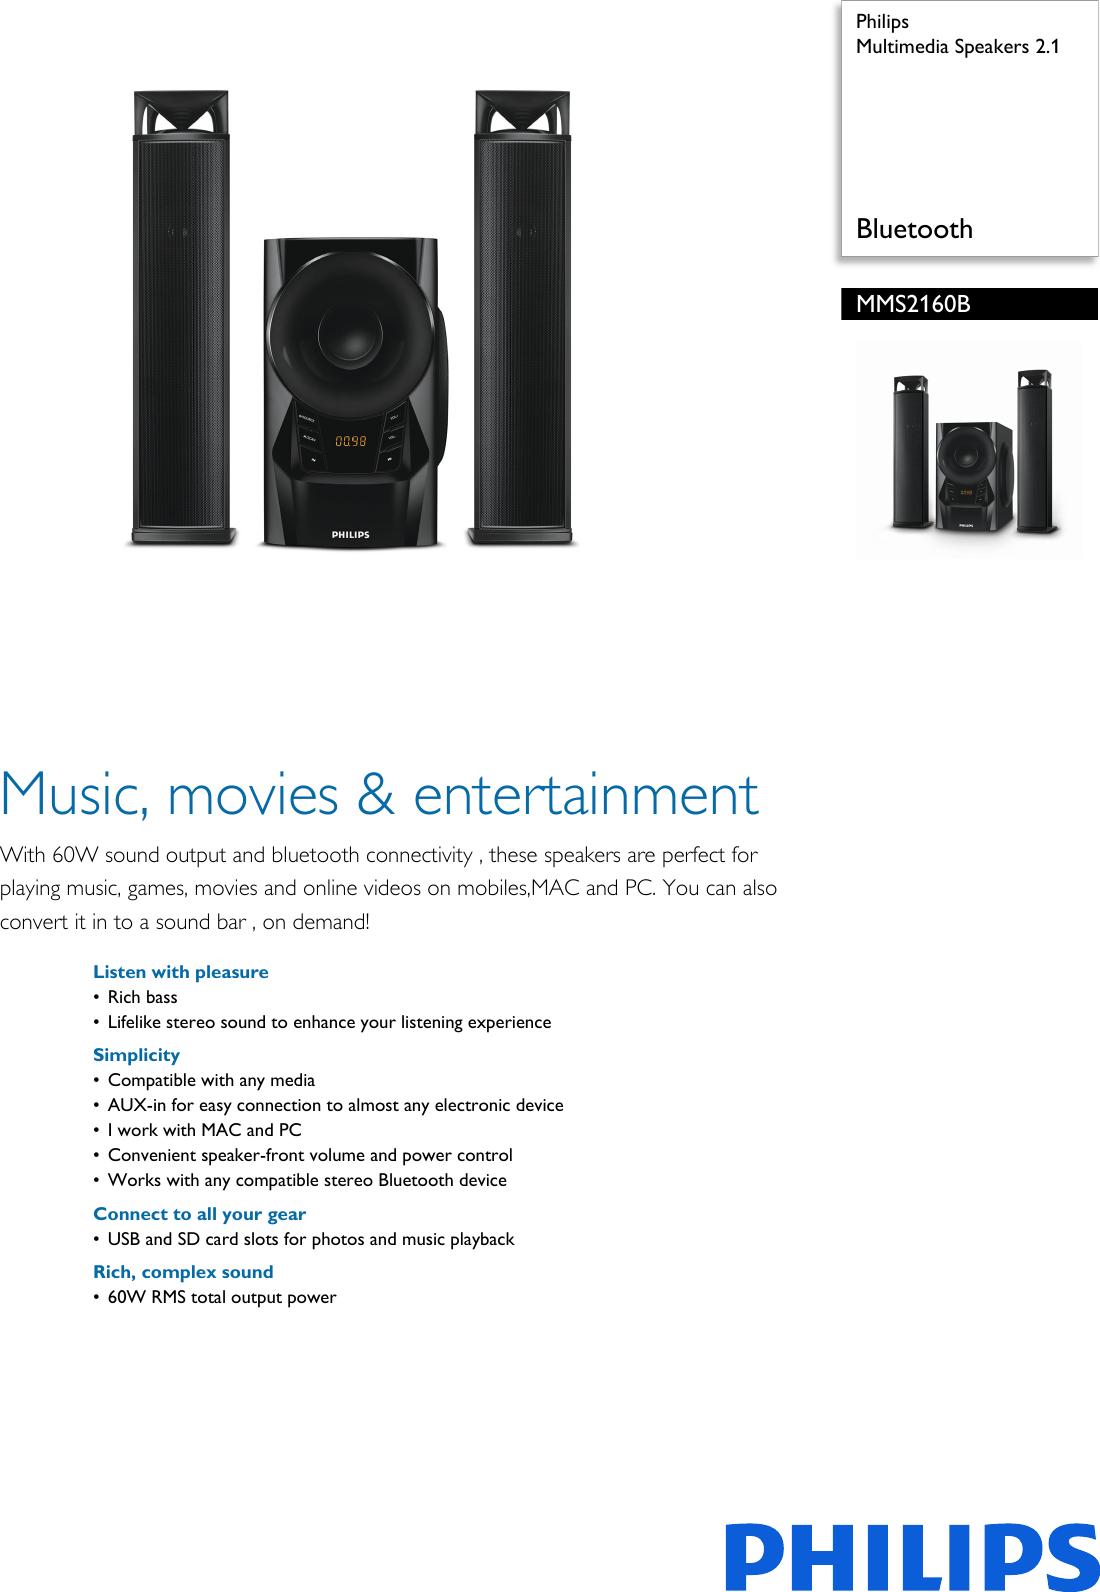 philips mms2160b 94 multimedia speakers 2 1 user manual leaflet rh usermanual wiki Philips M3001A Module Philips Transport Monitor